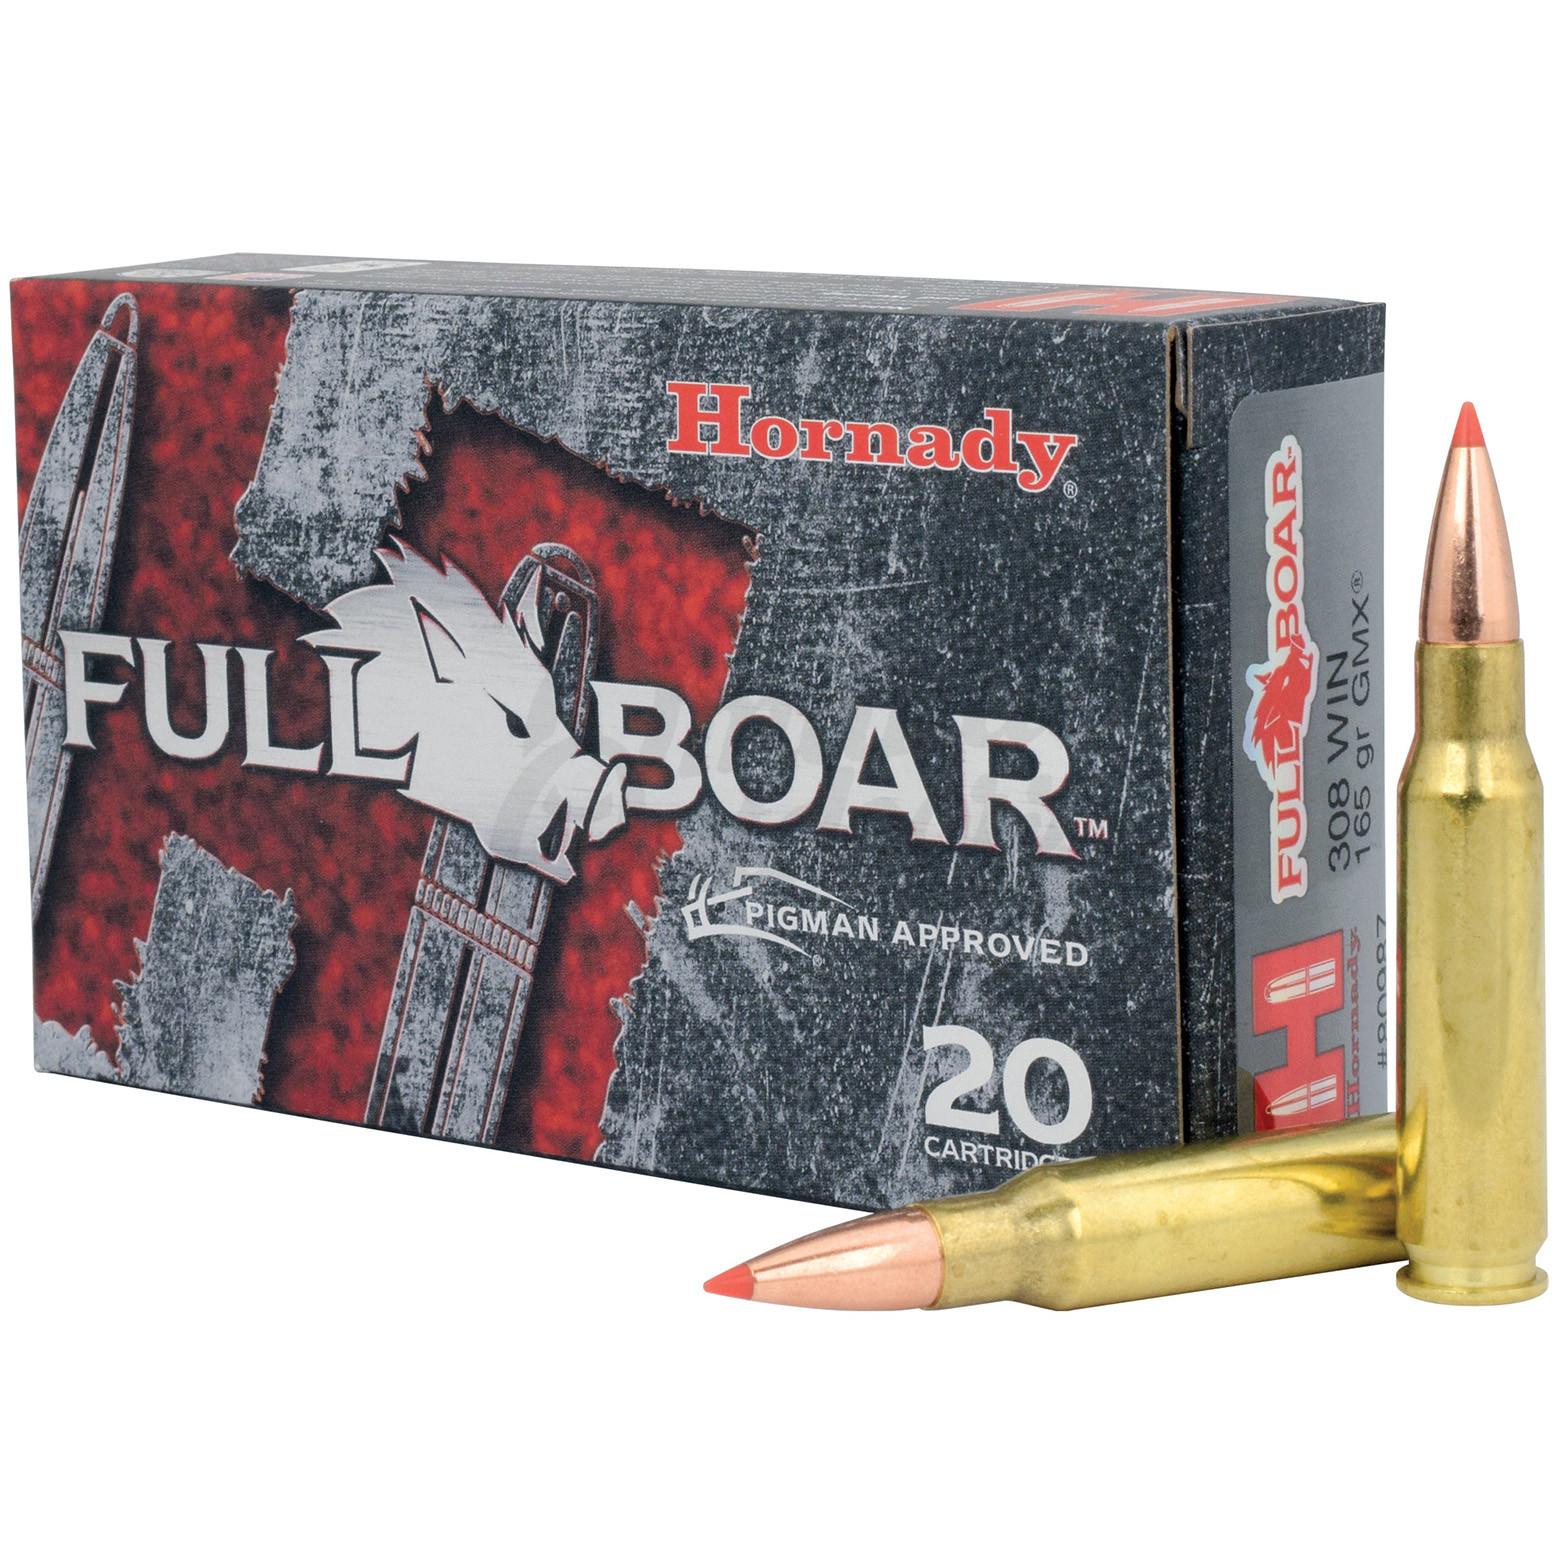 Hornady Full Boar 308 Winchester 165 Grain GMX 20 Round Ammo Box 80987